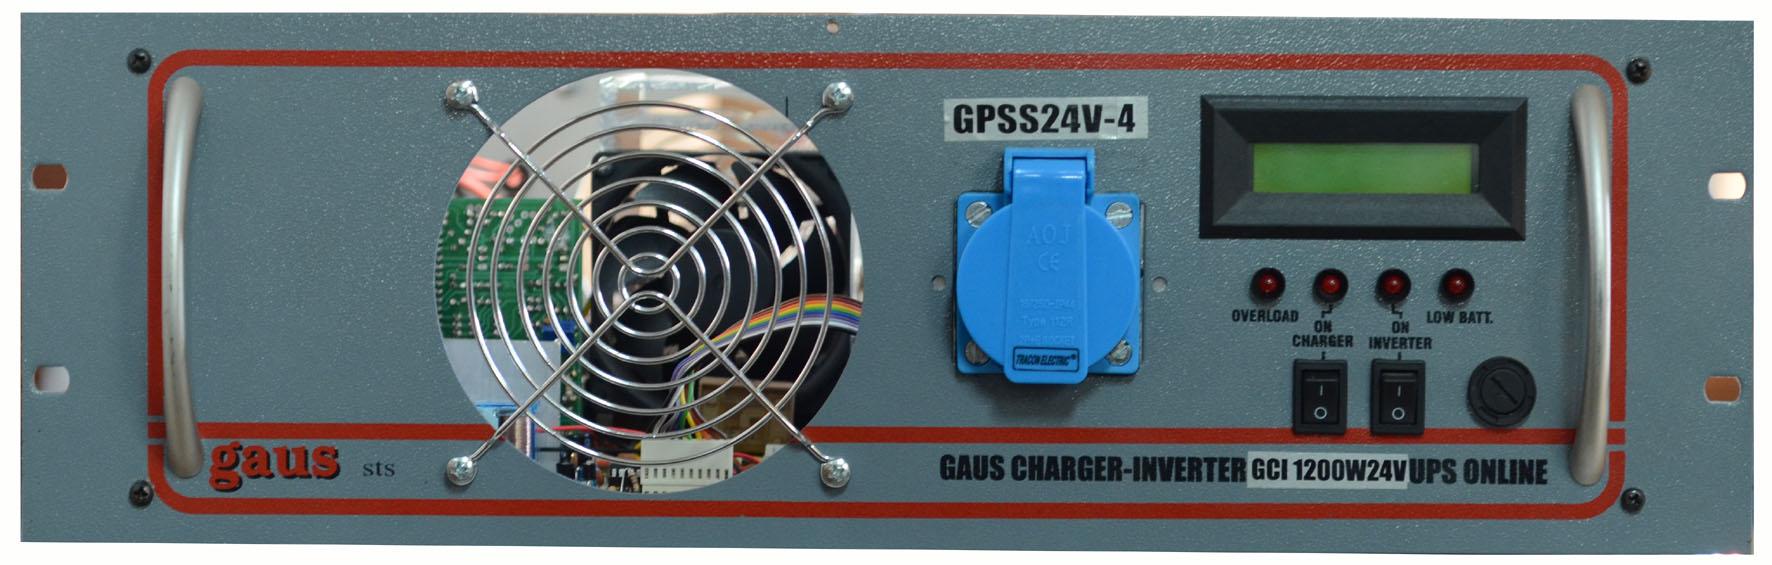 GPSS24V-4